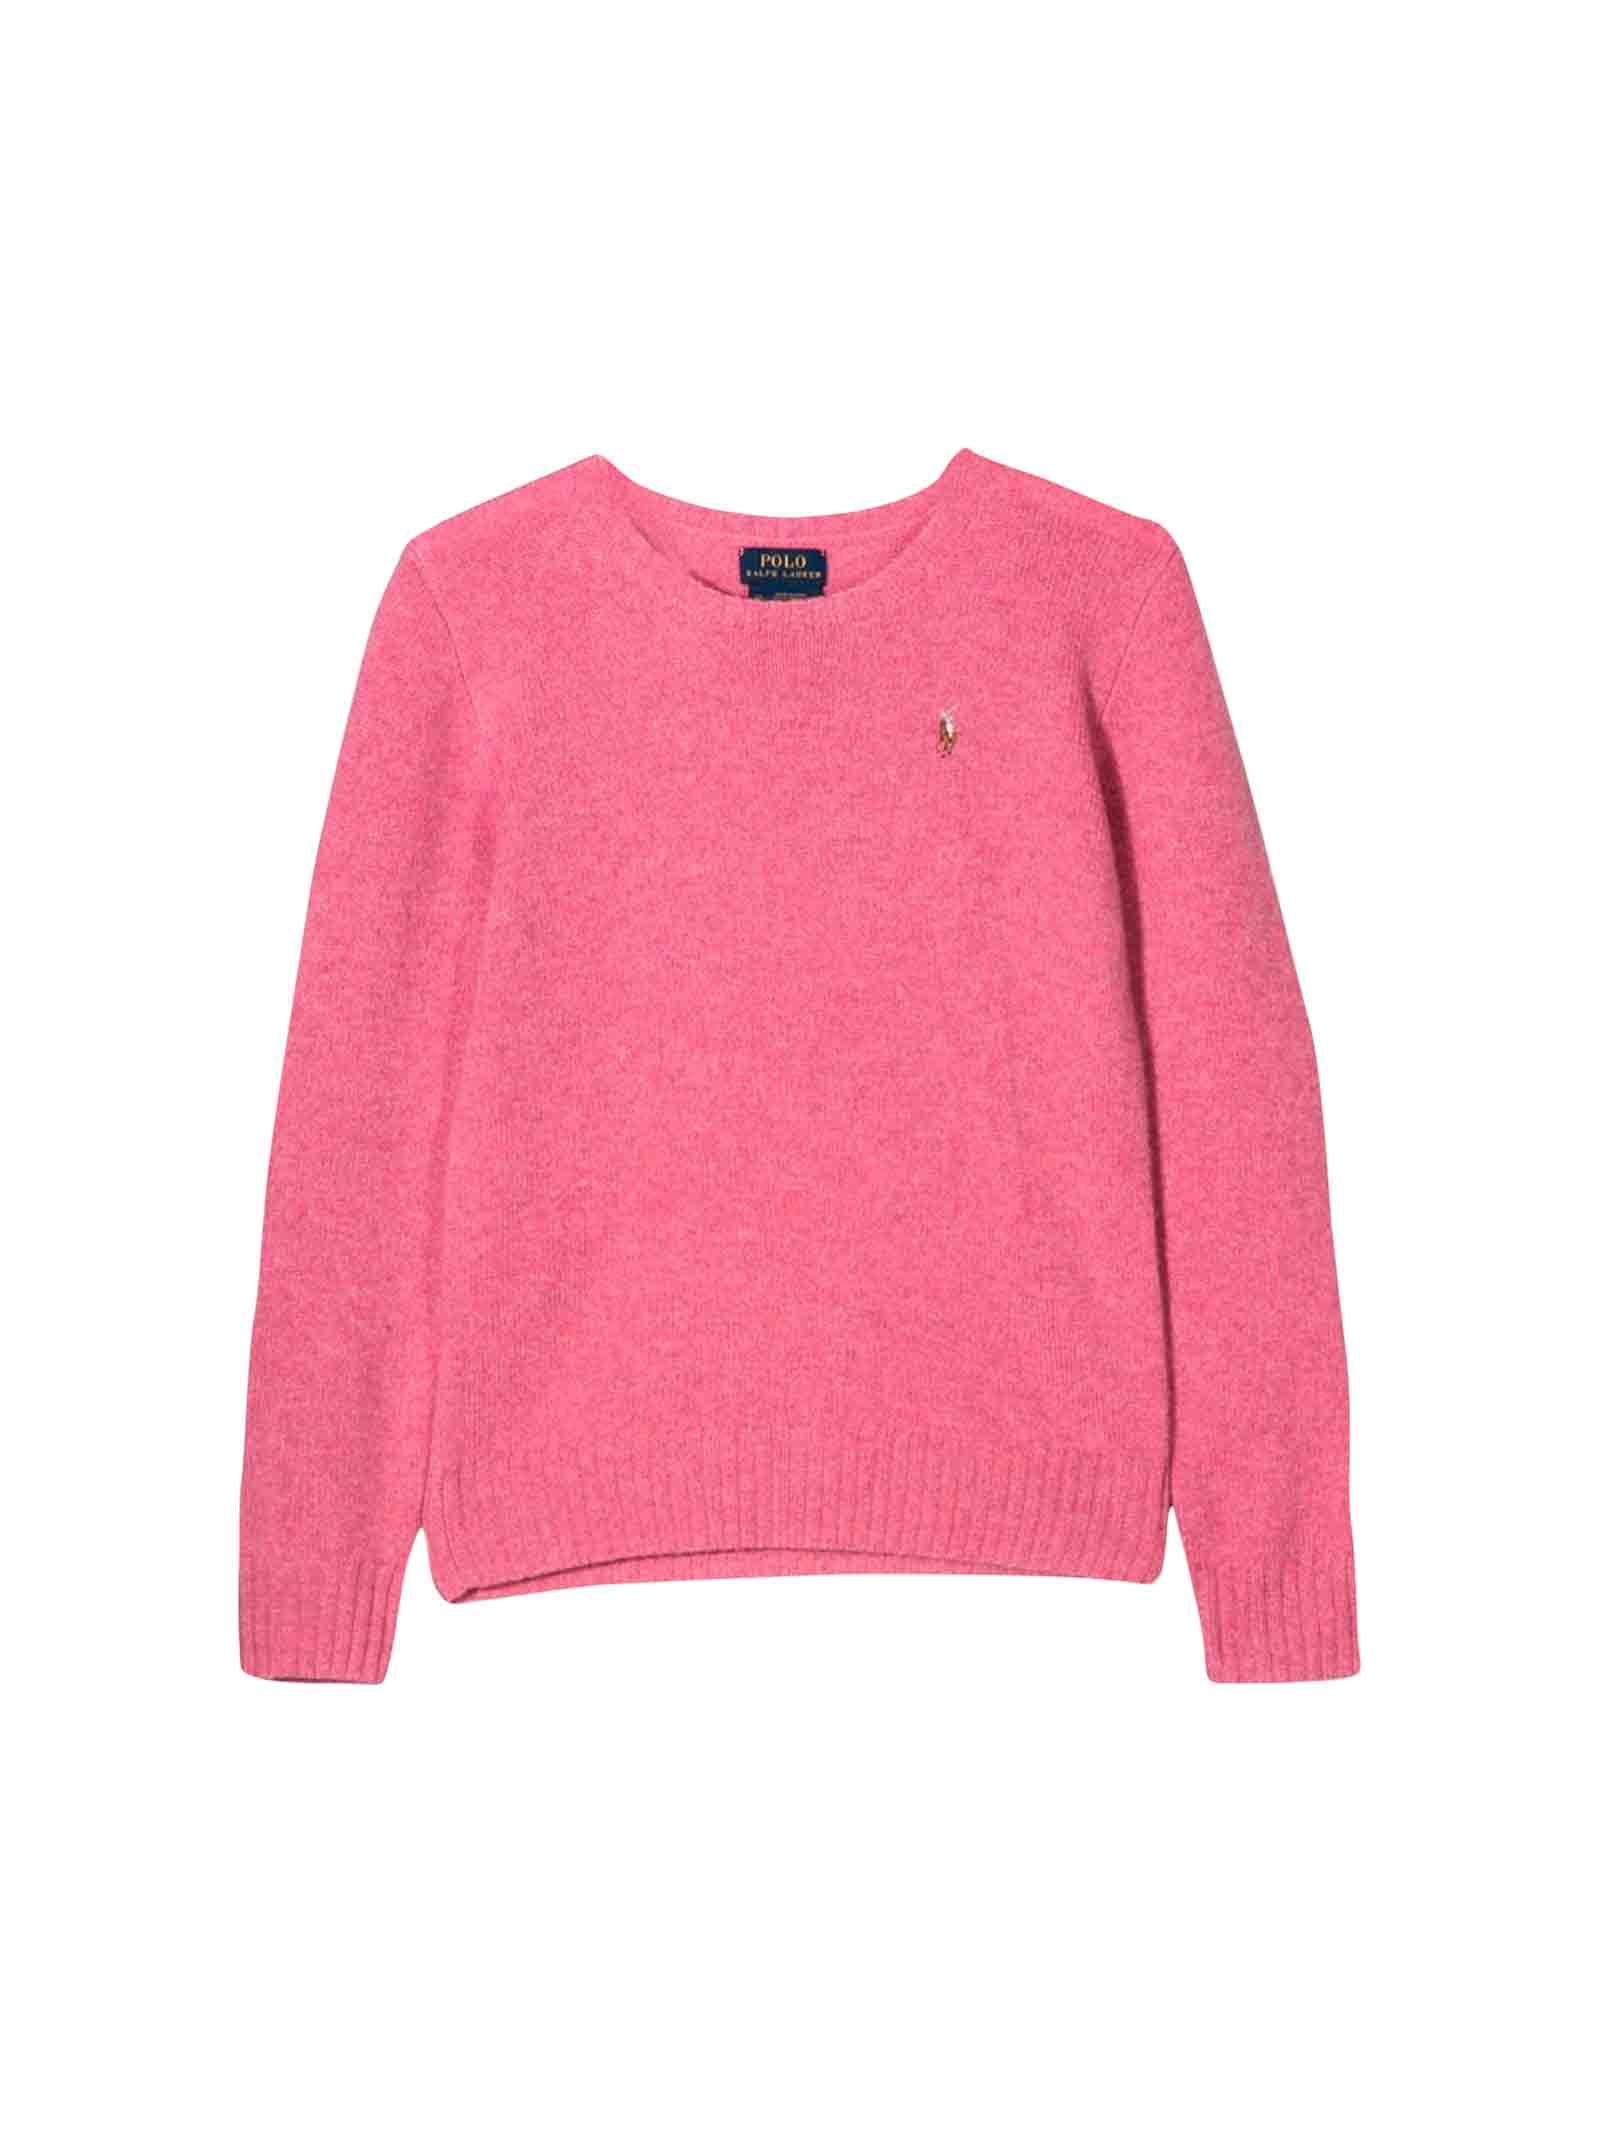 reputable site c27c4 20cc3 Maglione rosa bambina Ralph Lauren kids